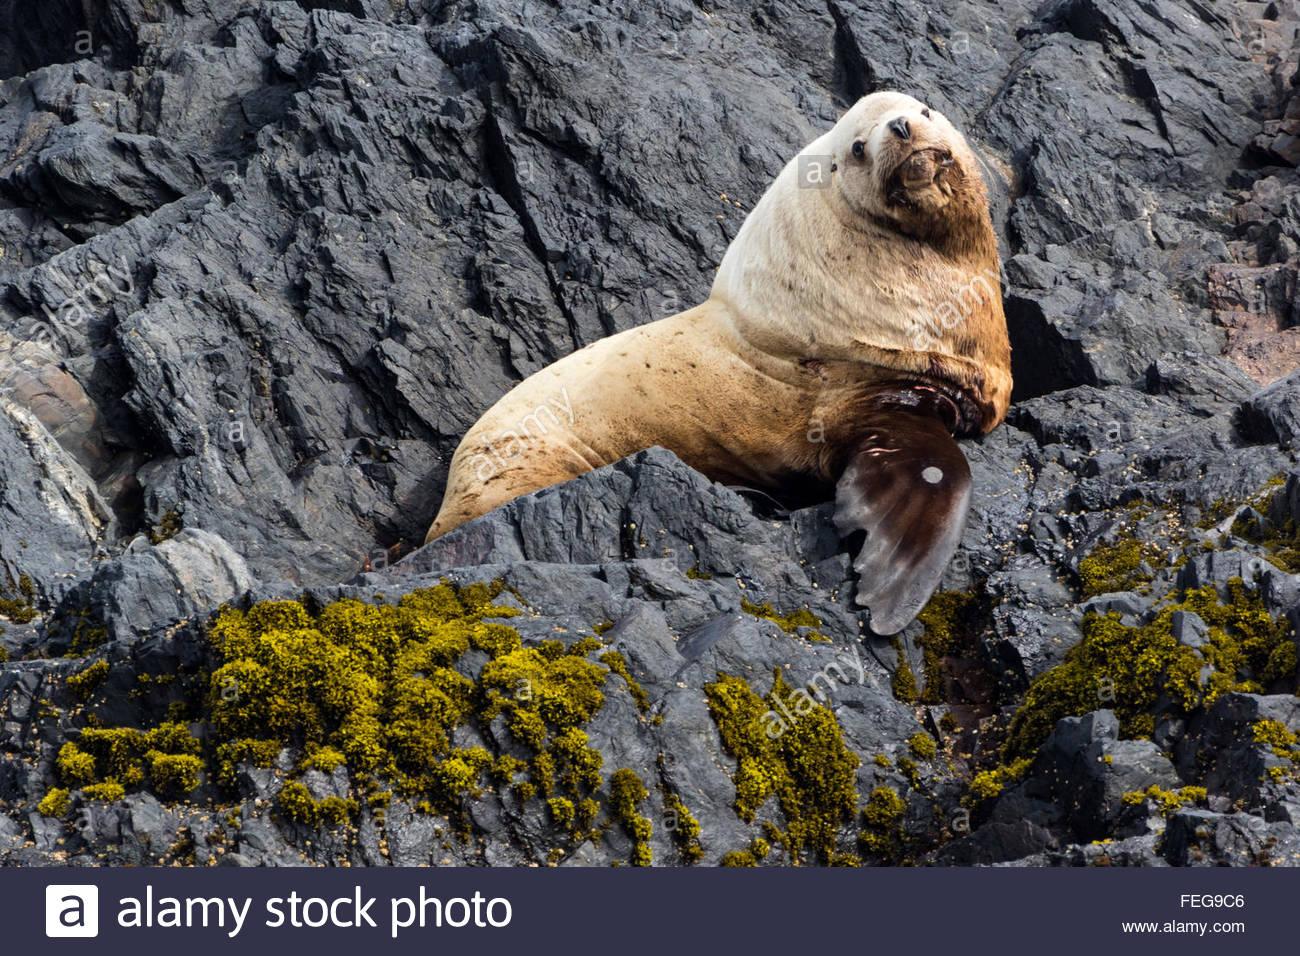 A fat and curious Steller Sea Lion sits atop a rock along the coast of Alaska - Stock Image